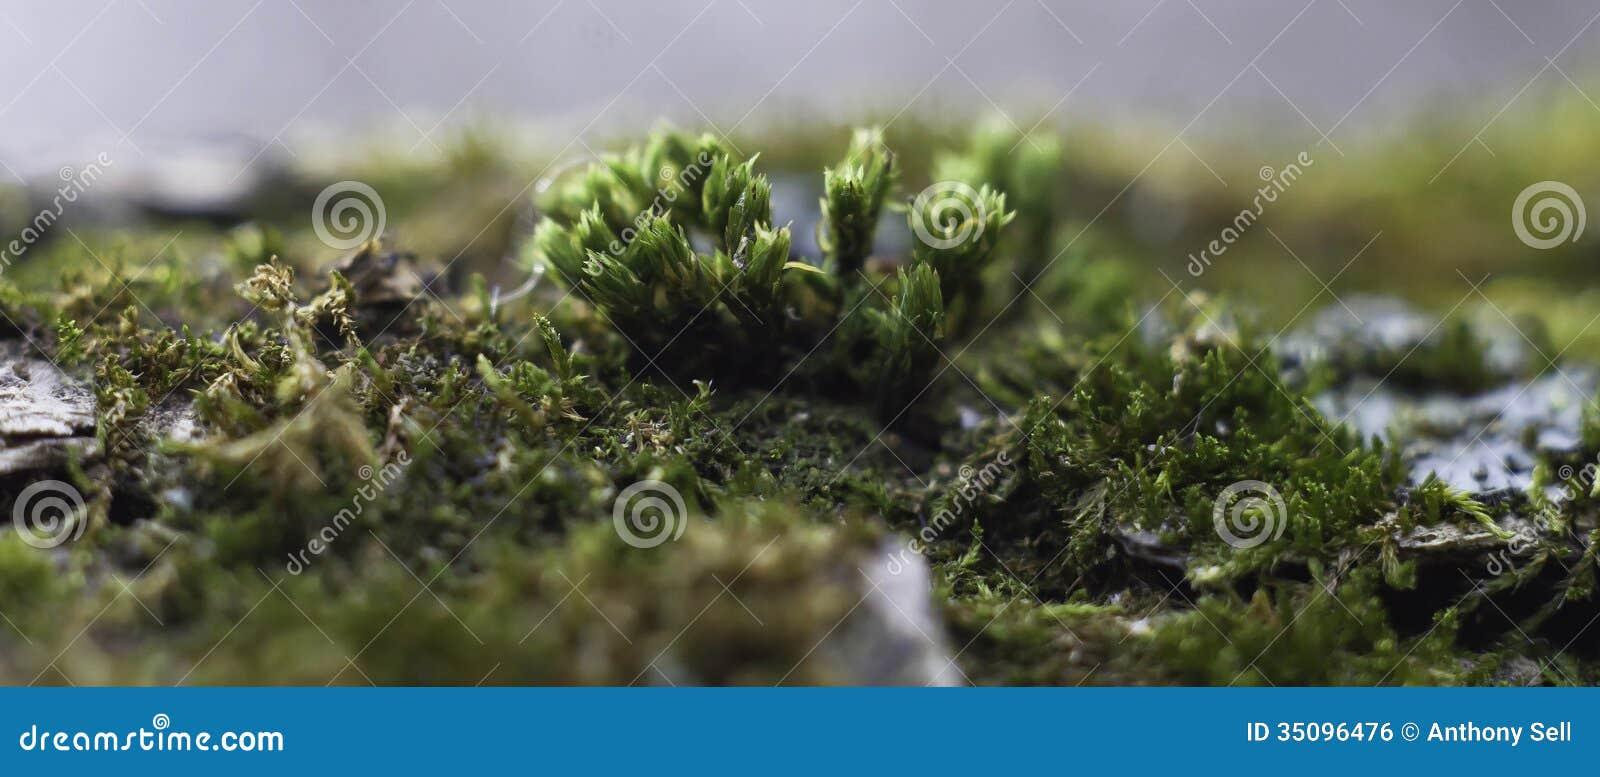 Moss Landscape